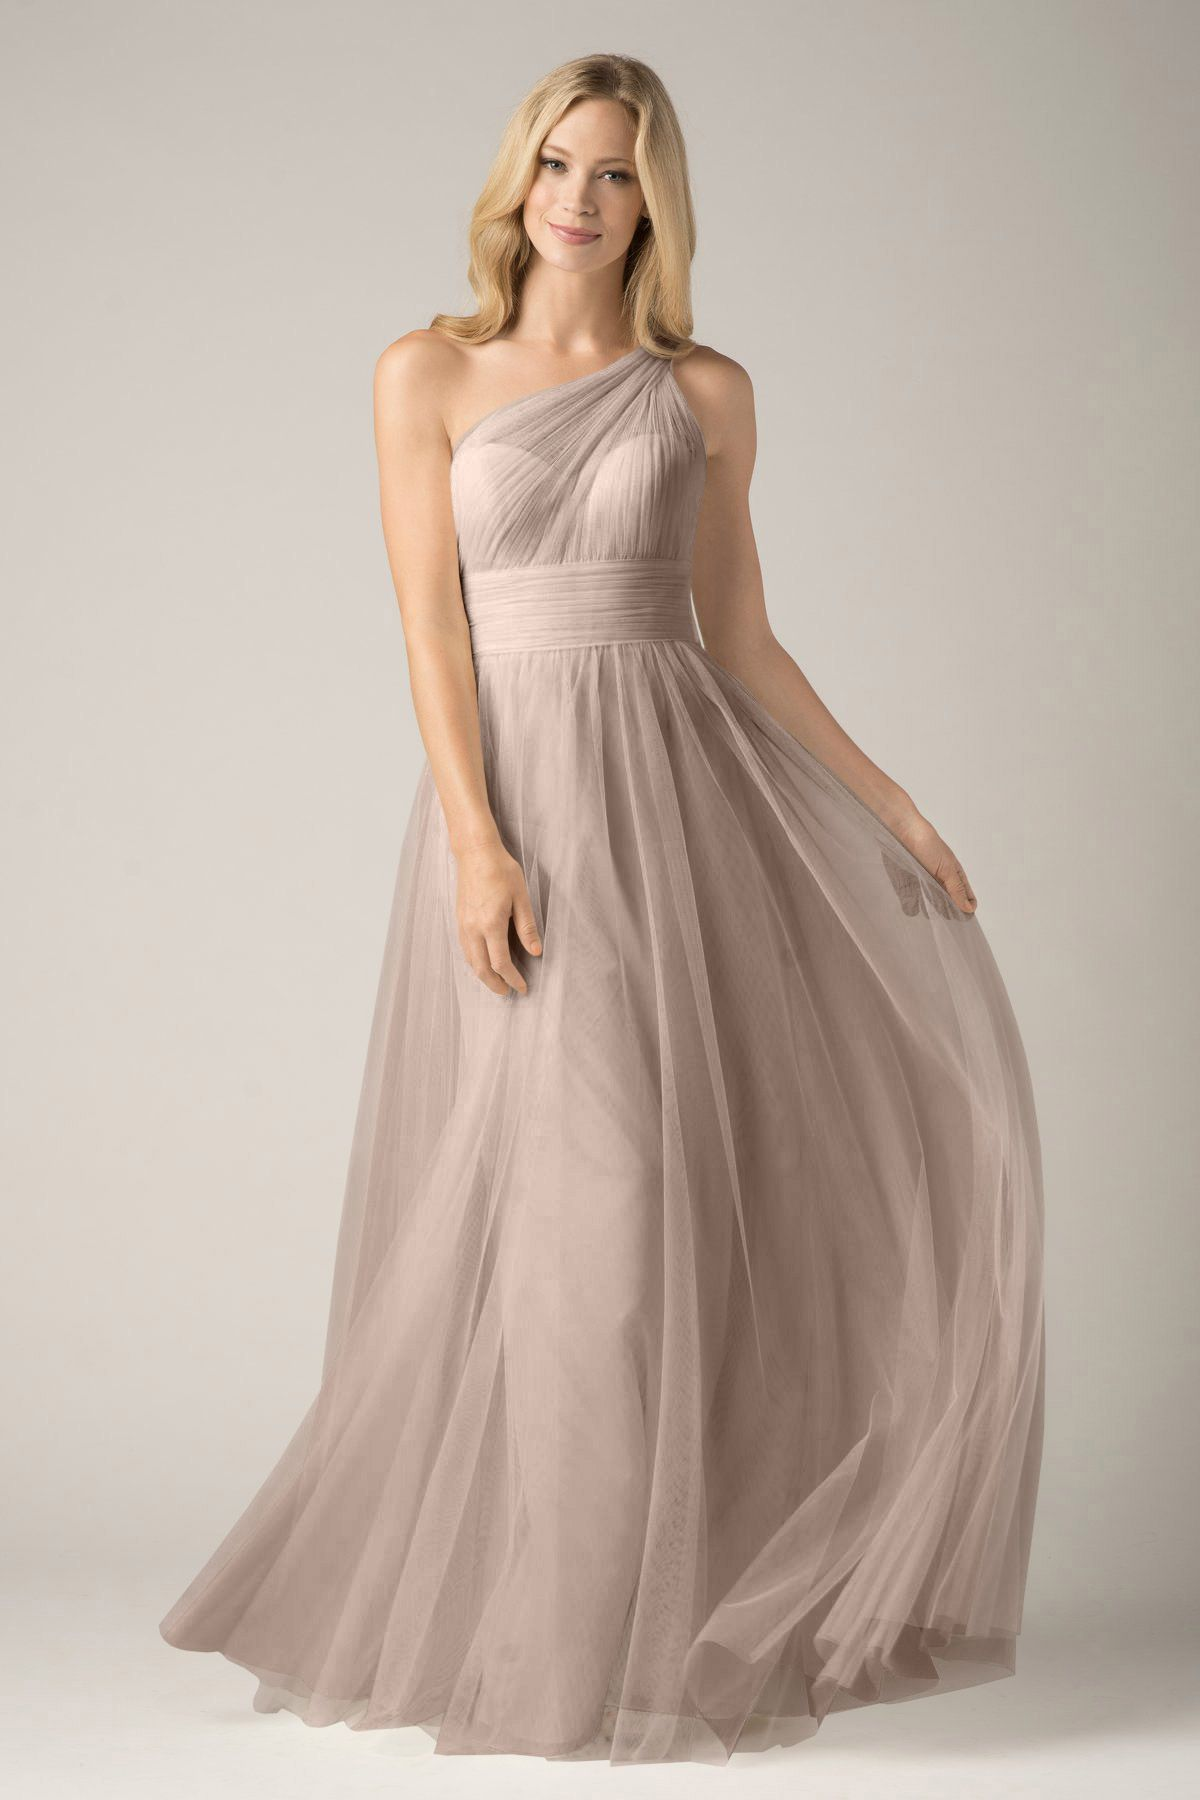 Wishesbridal Grey Tulle One Shoulder Floor Length Princess Maternity Bridesmaiddress B1wa0019